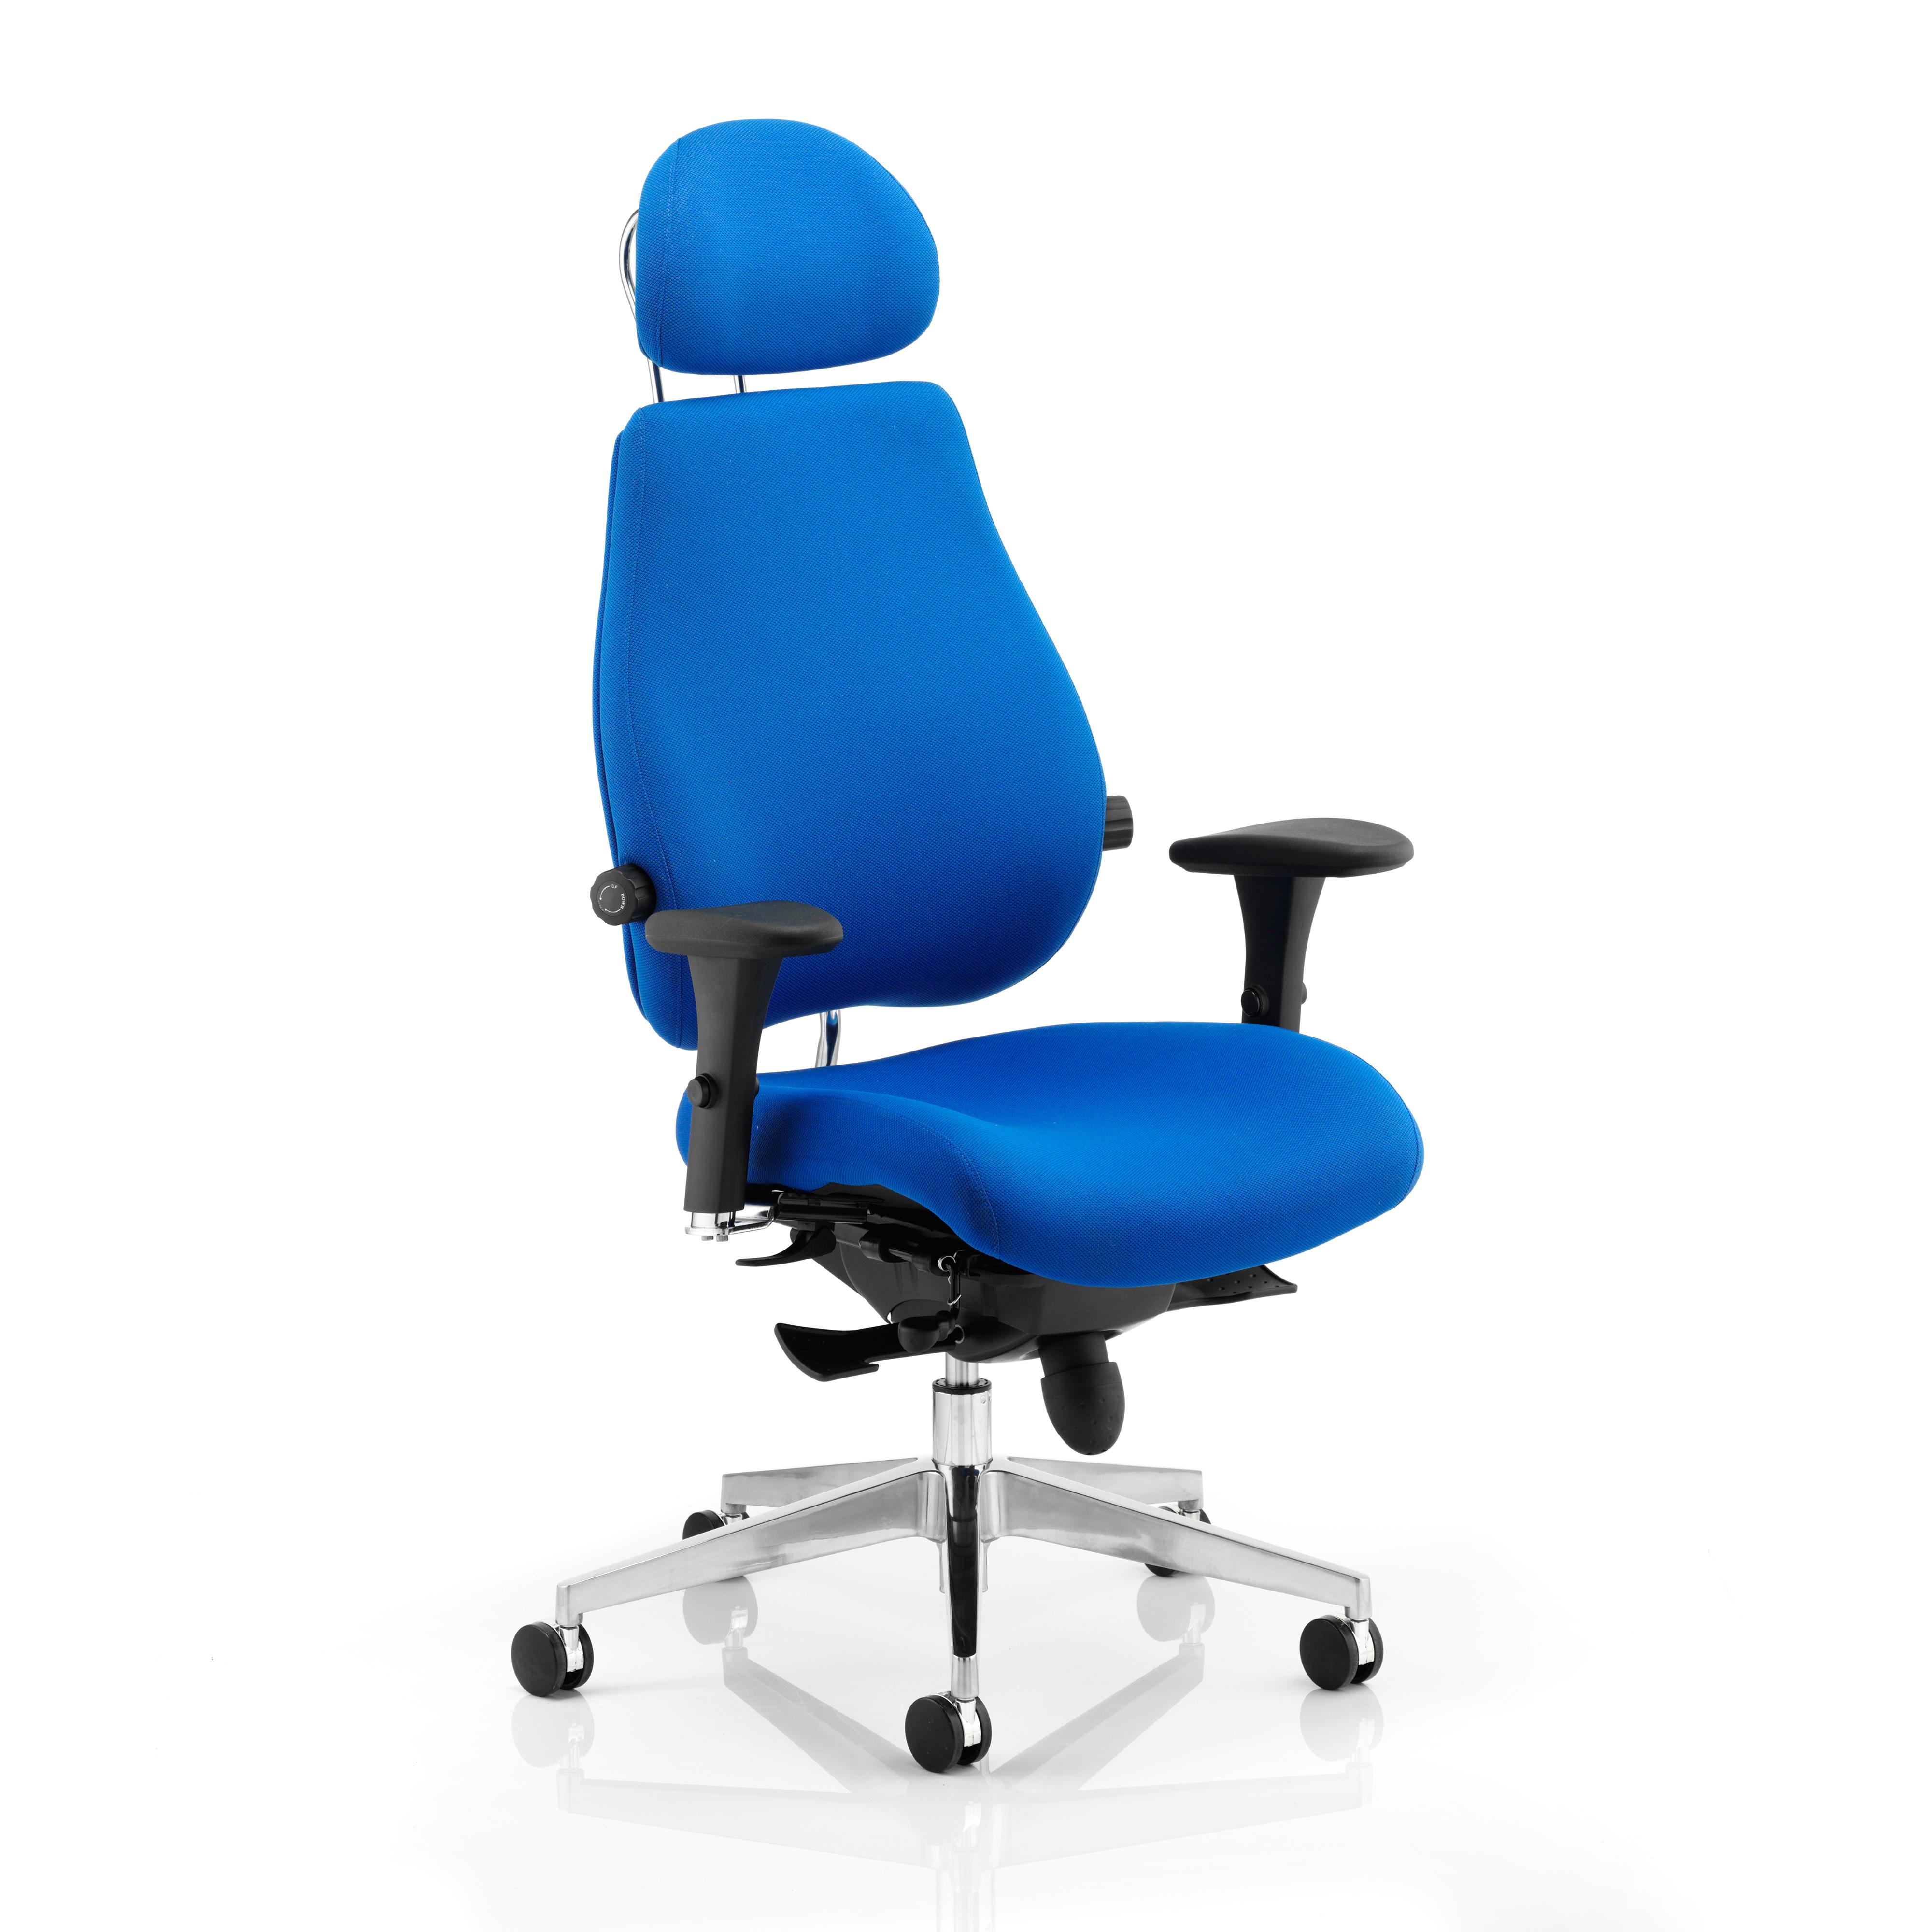 Adroit Chiro Plus Ultimate Blue 495x520-560x470-540mm Ref PO000012